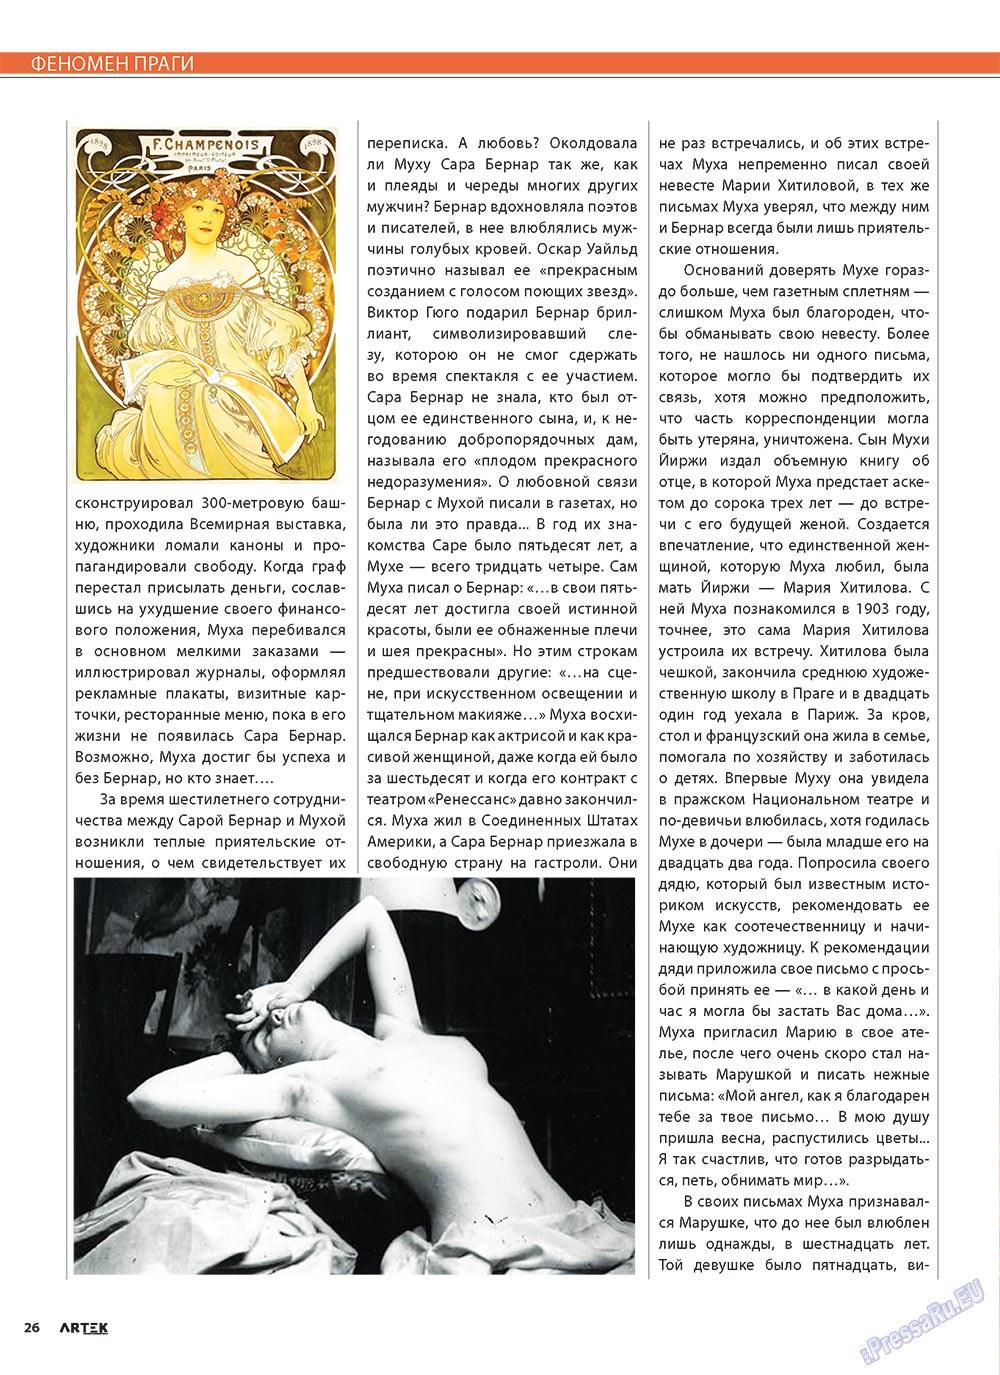 Артек (журнал). 2010 год, номер 6, стр. 28